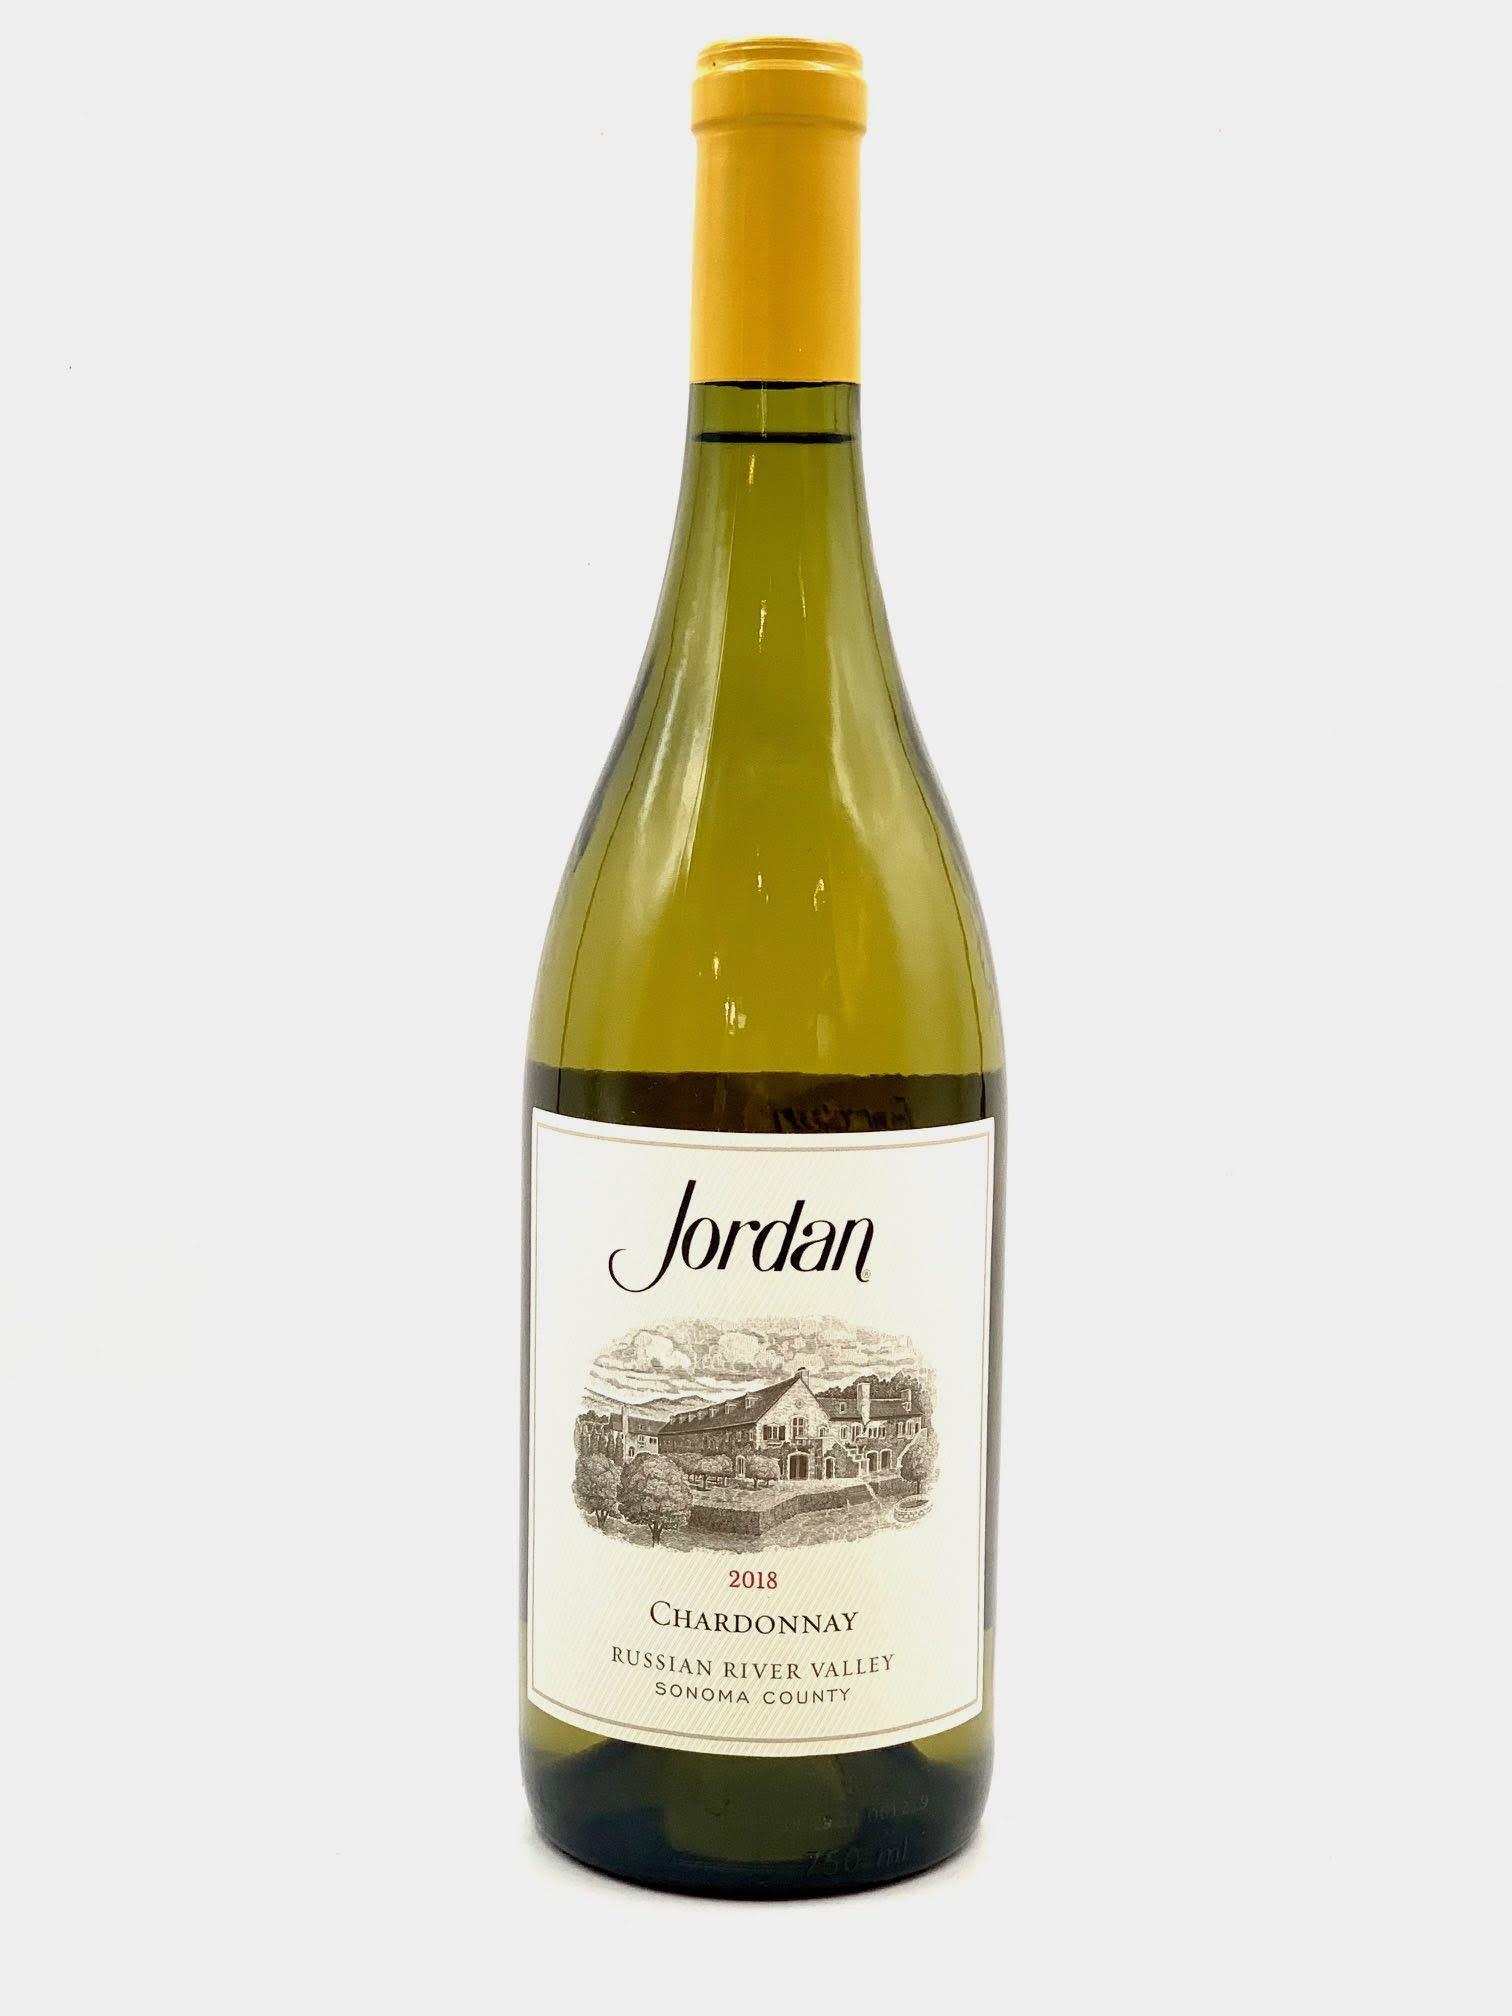 Russian River Valley Chardonnay 2018 Jordan Winery  750ml